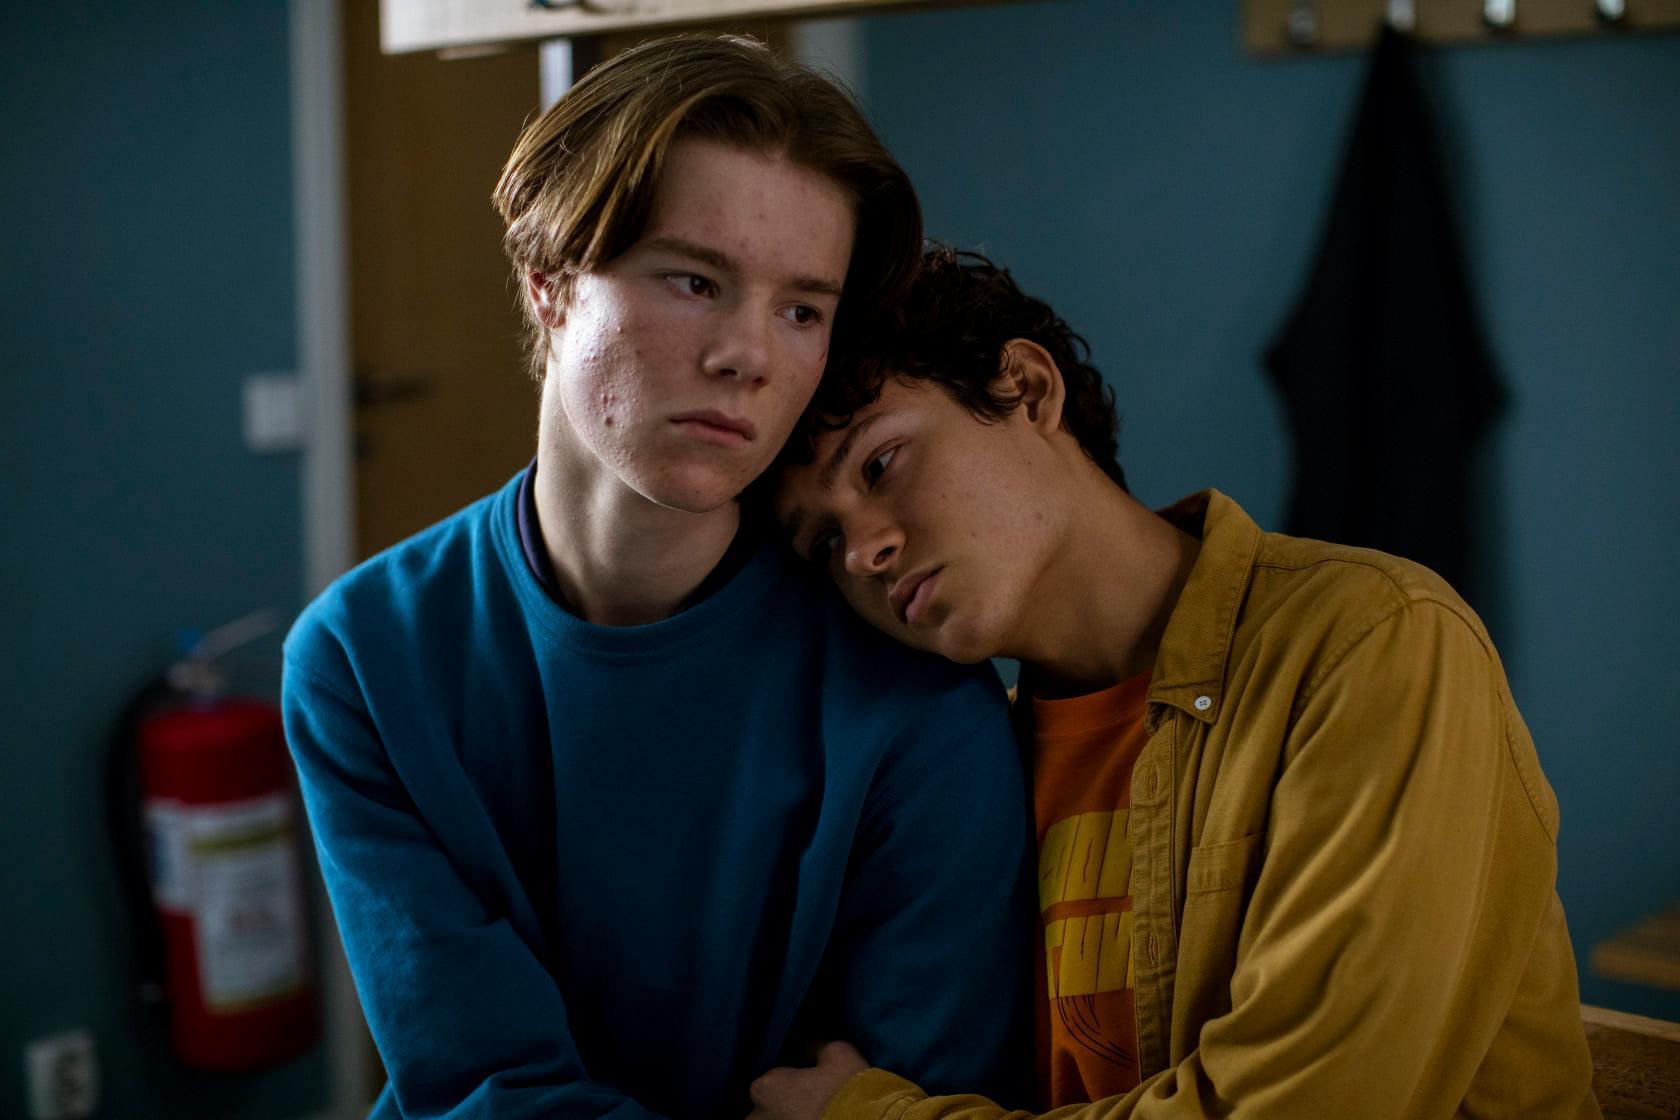 Young Royals série da Netflix